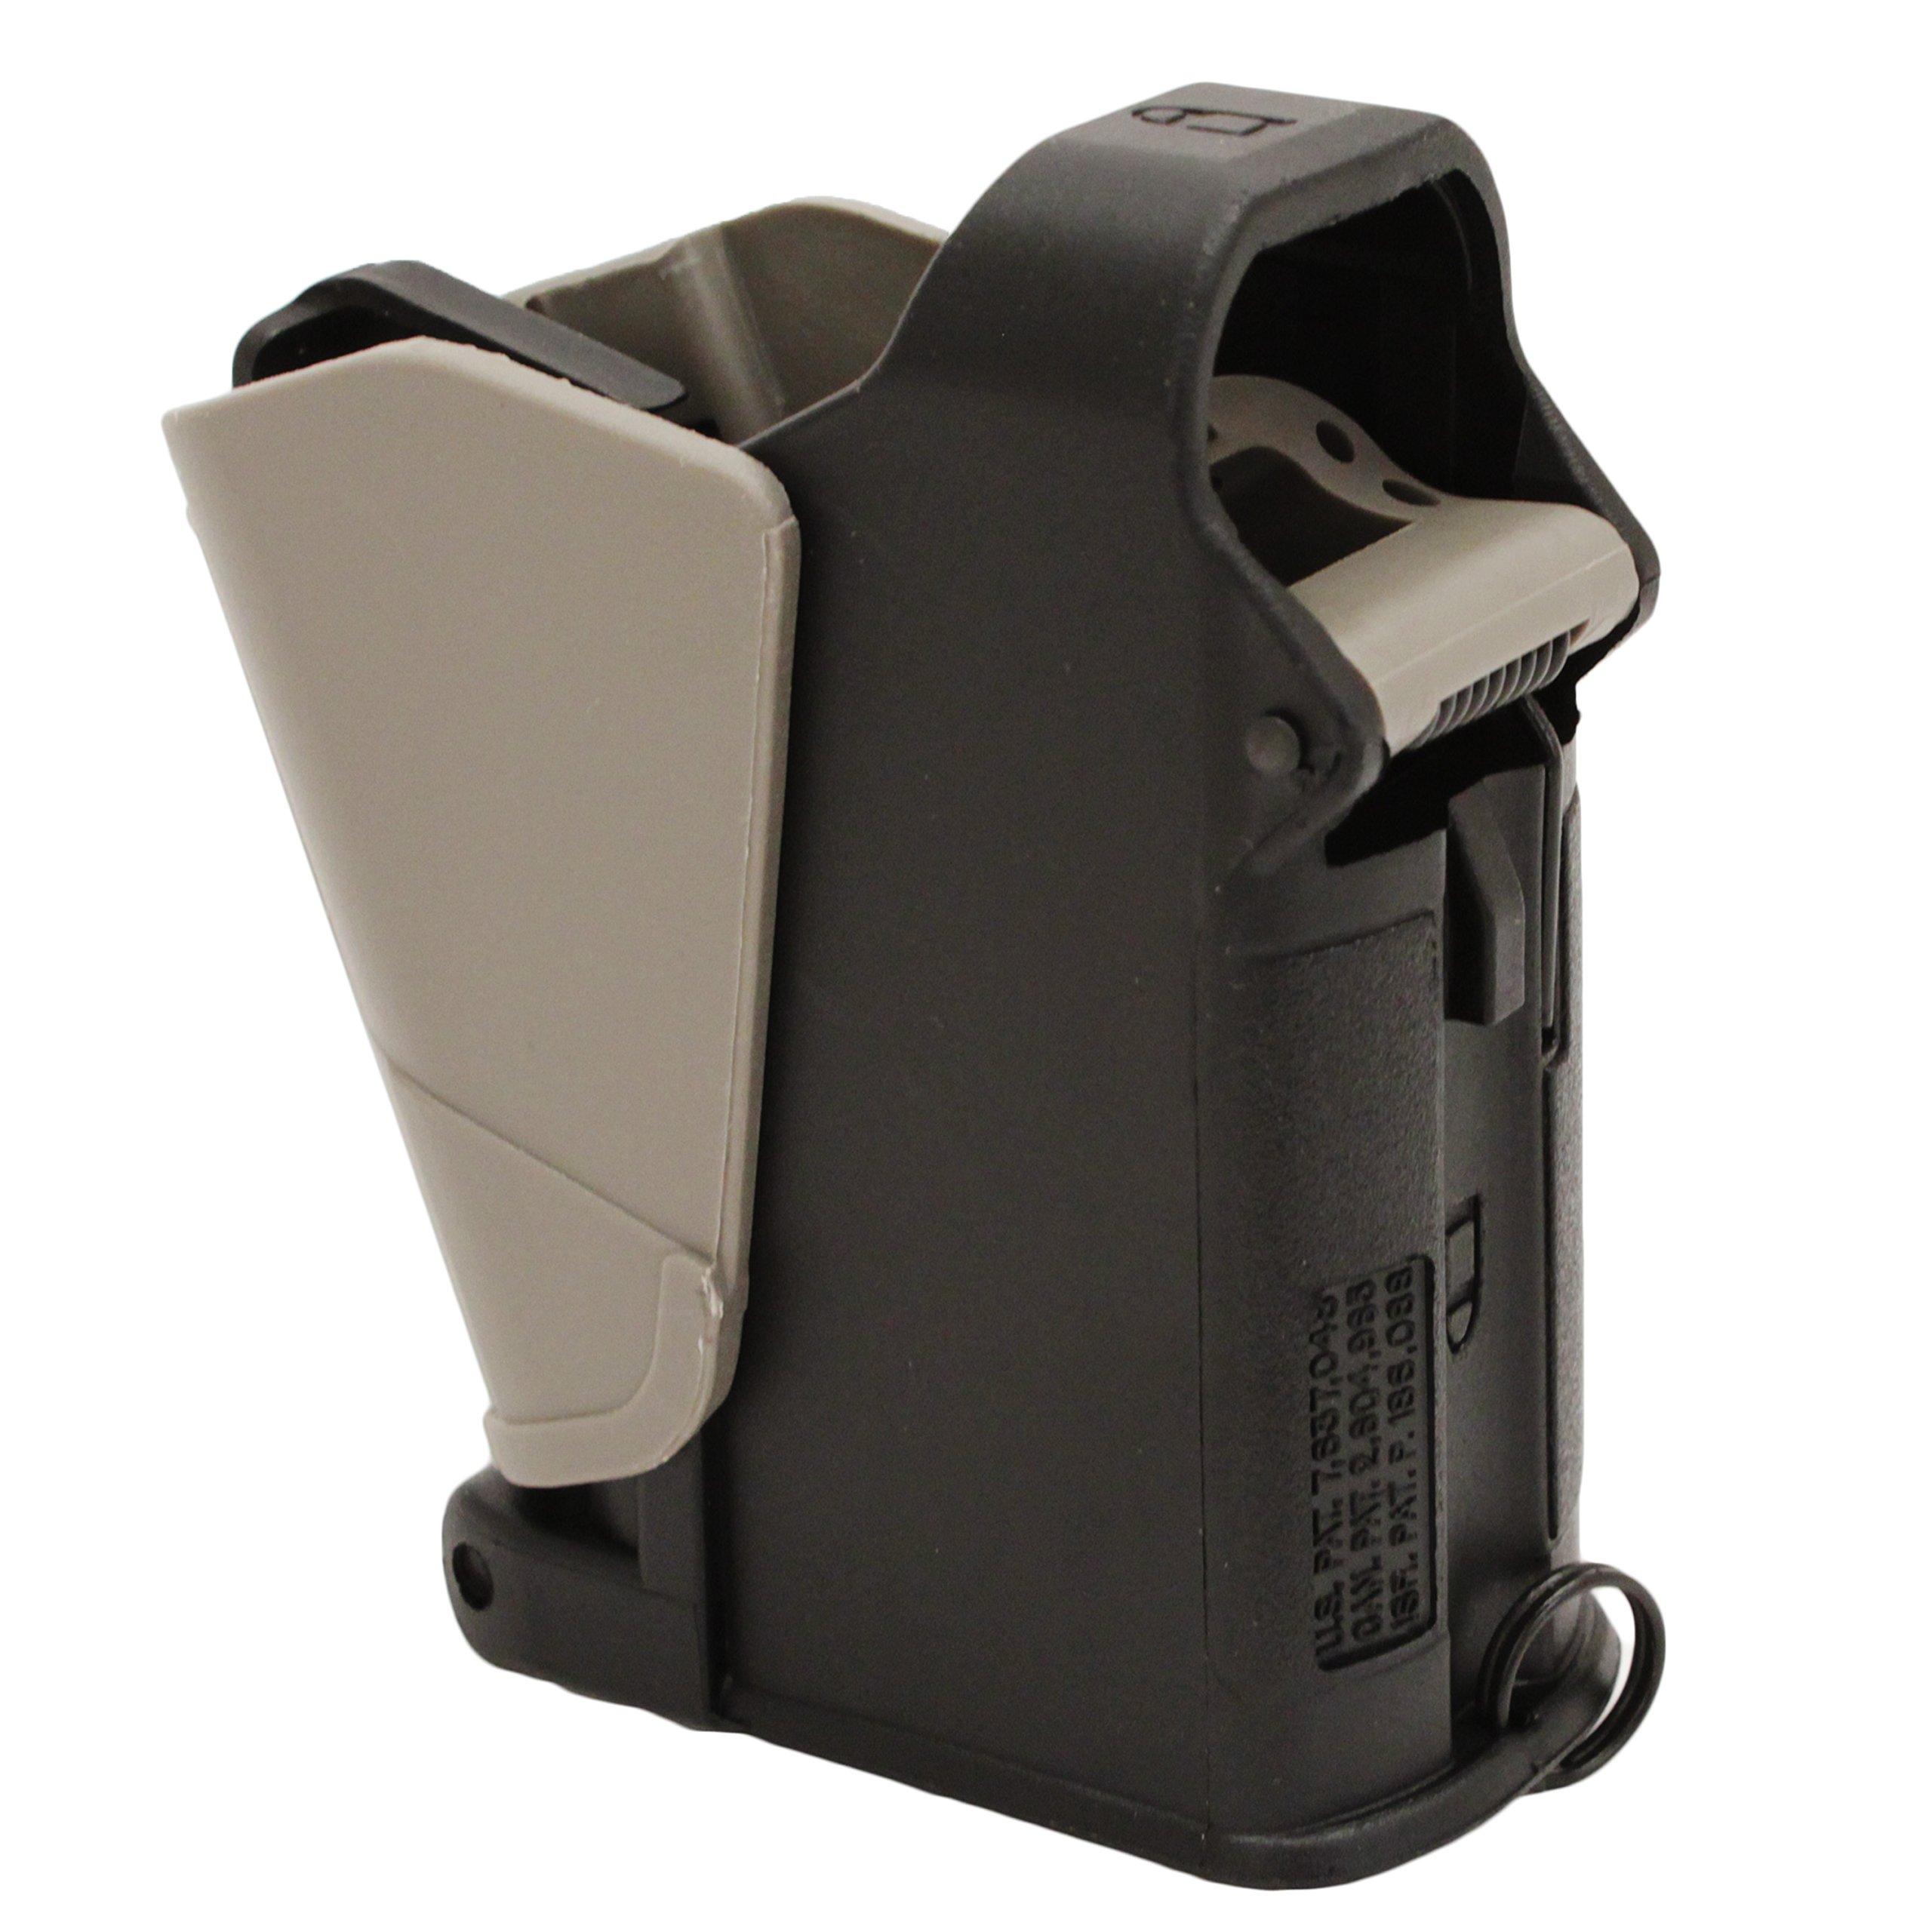 Maglula 22UpLULA Converted Pistol Mag Loader Description - UP62B - Black - Made For Loading .22LR Wide Body Mags by Magula